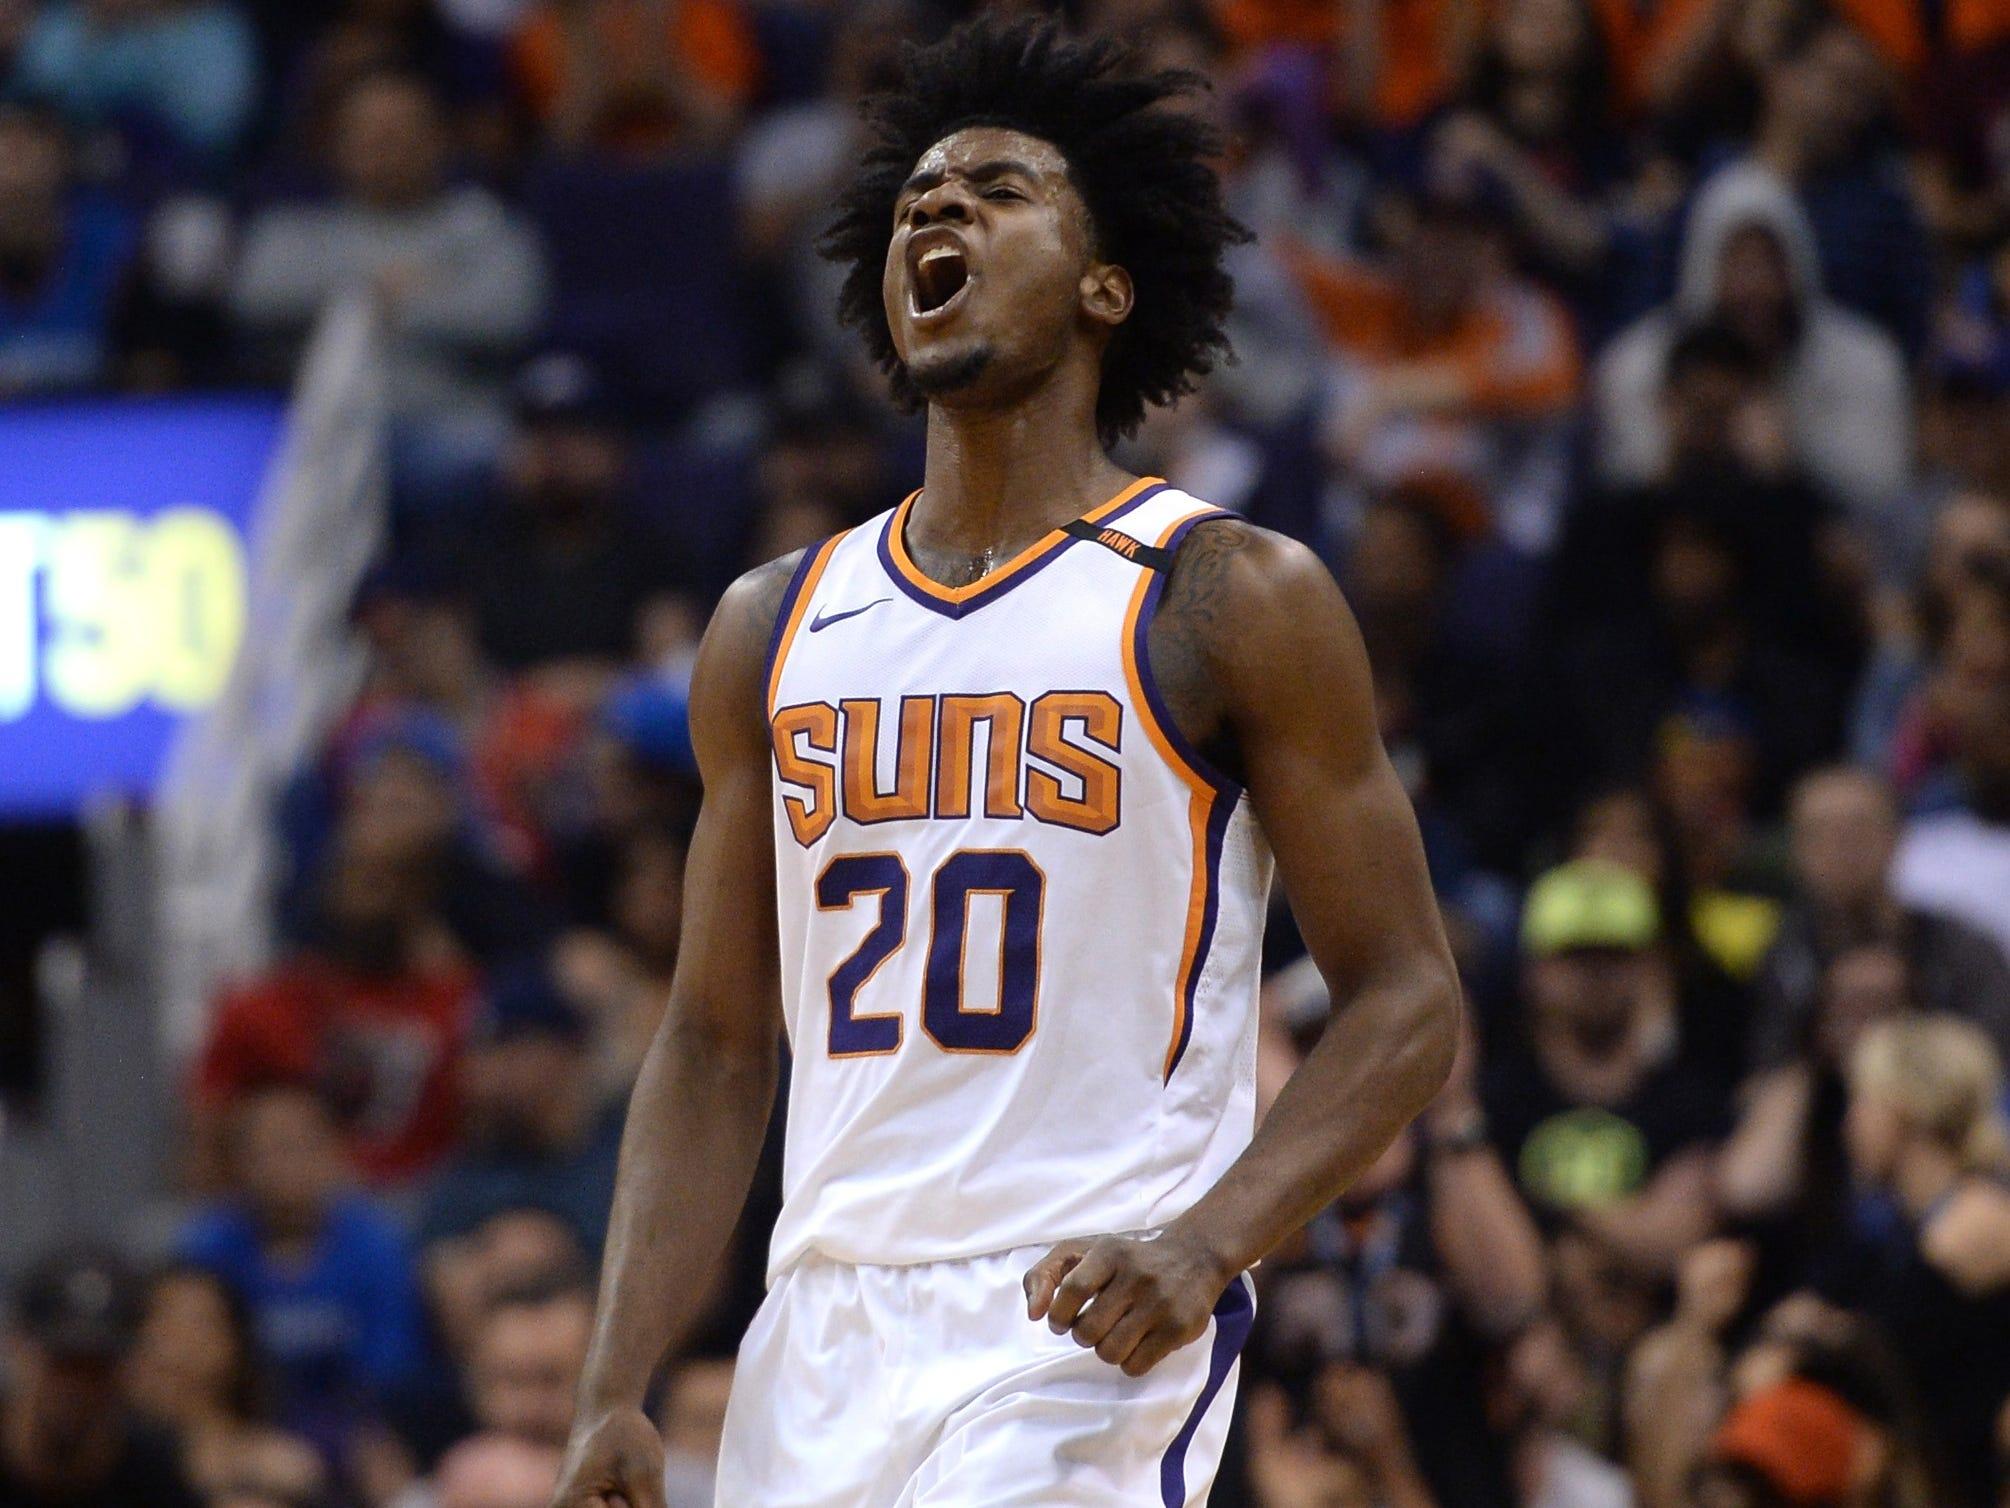 Josh Jackson, Phoenix Suns — 21 (born 2/10/1997)